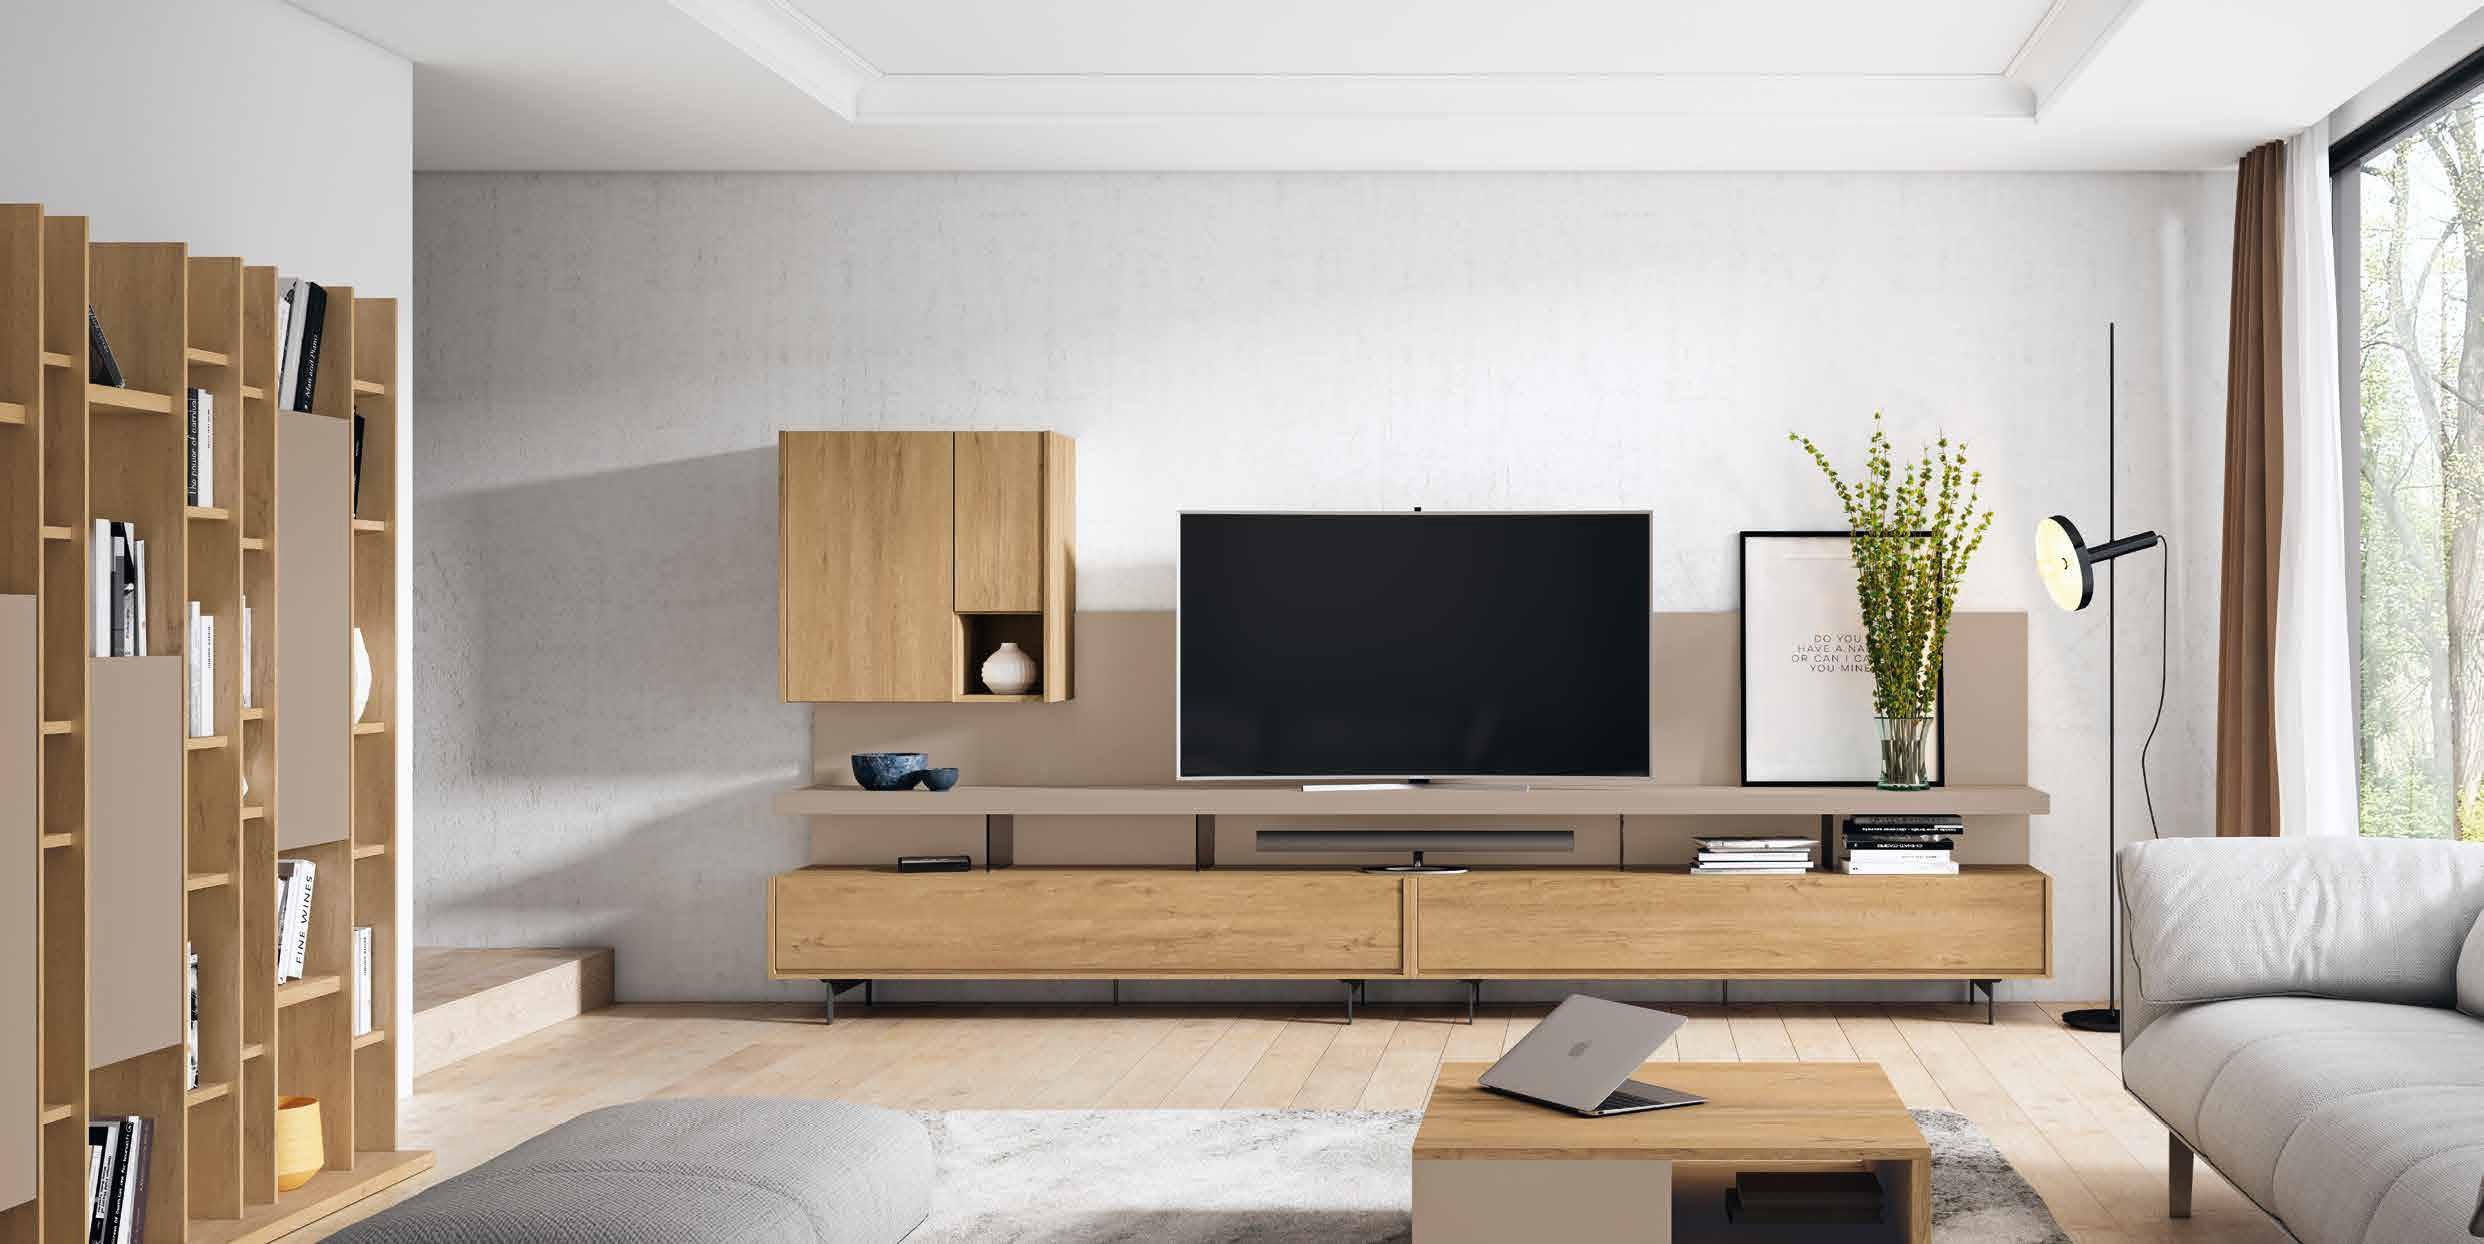 salon-moderno-Nativ-2019-muebles-paco-caballero-0920-5c8cea994db0f